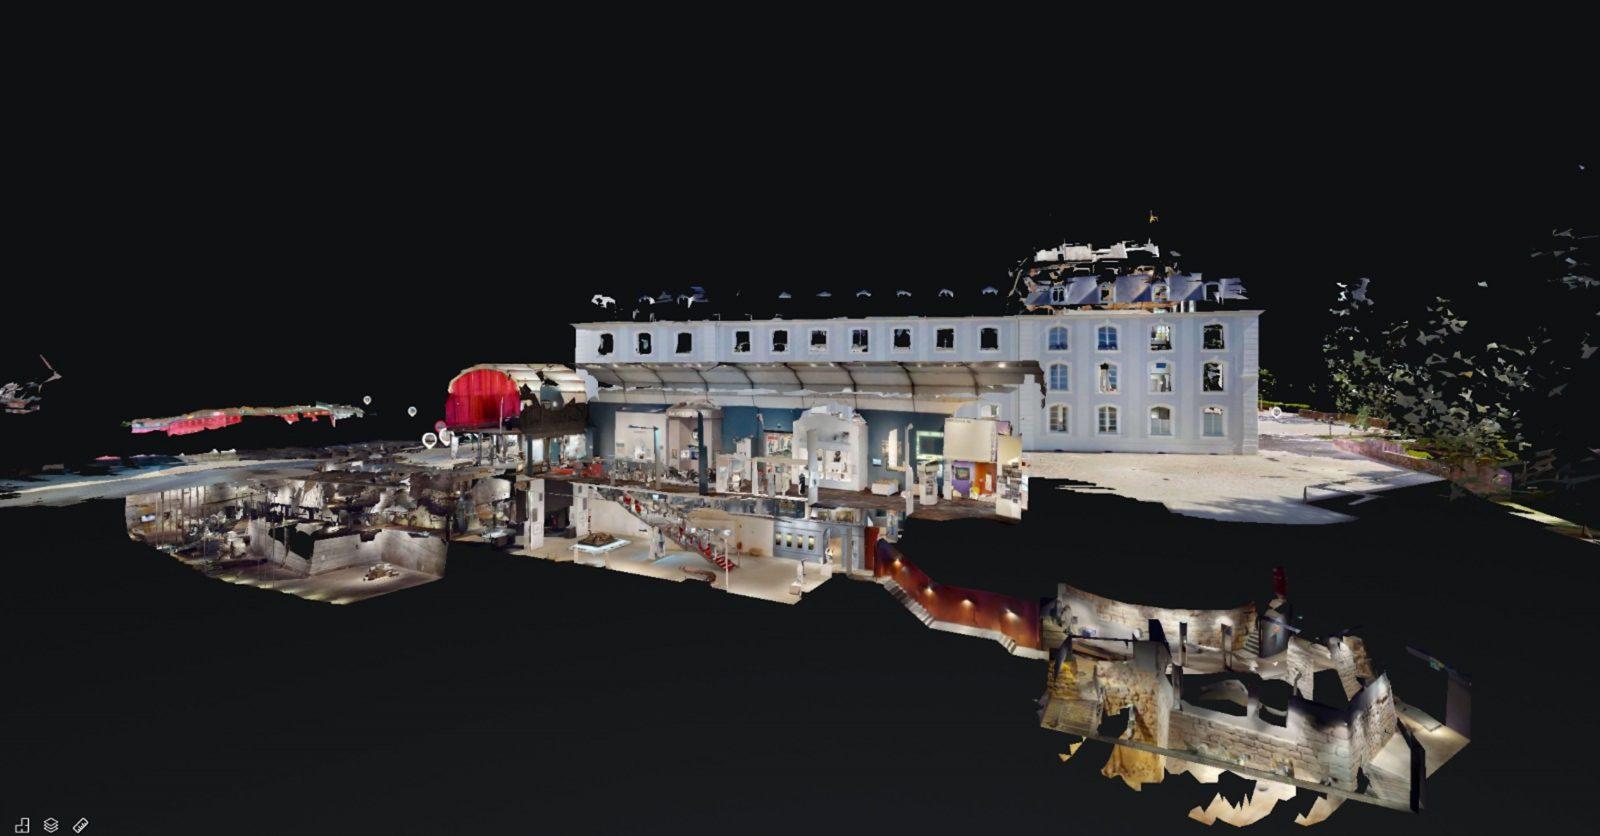 2.700 m² Ausstellungsfläche des Historischen Museums Saar